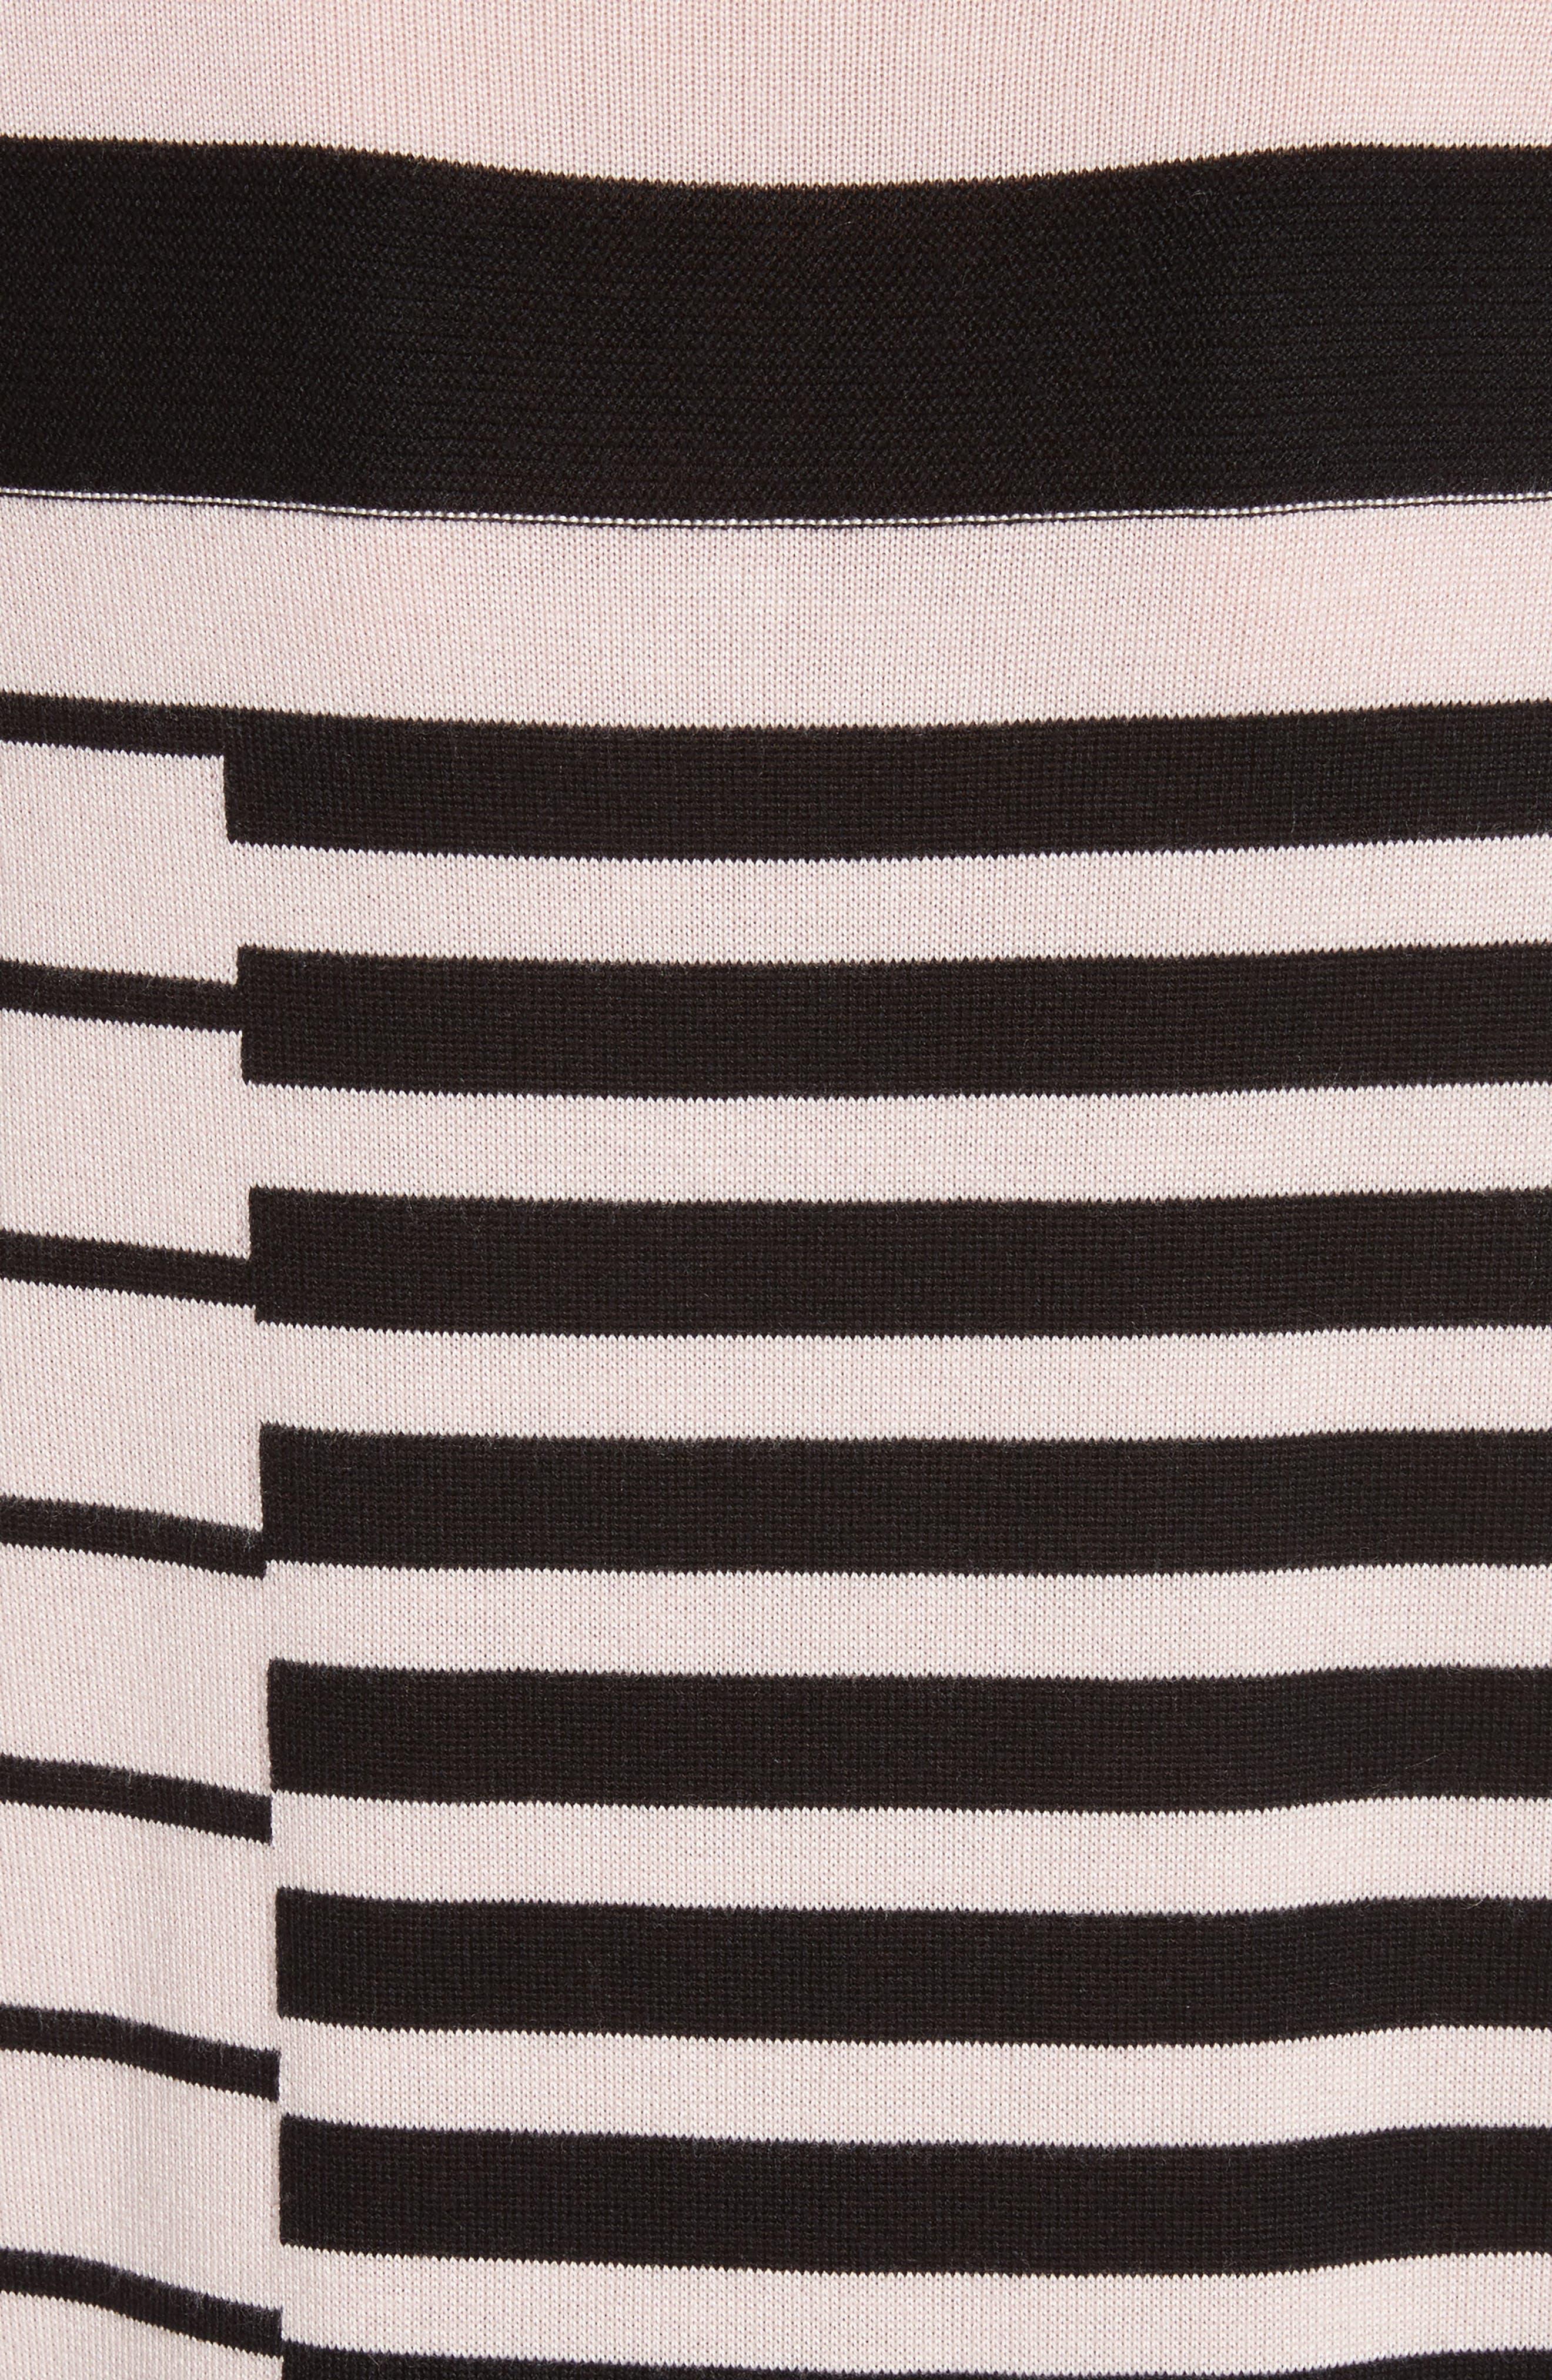 Intarsia Stripe Sweater,                             Alternate thumbnail 10, color,